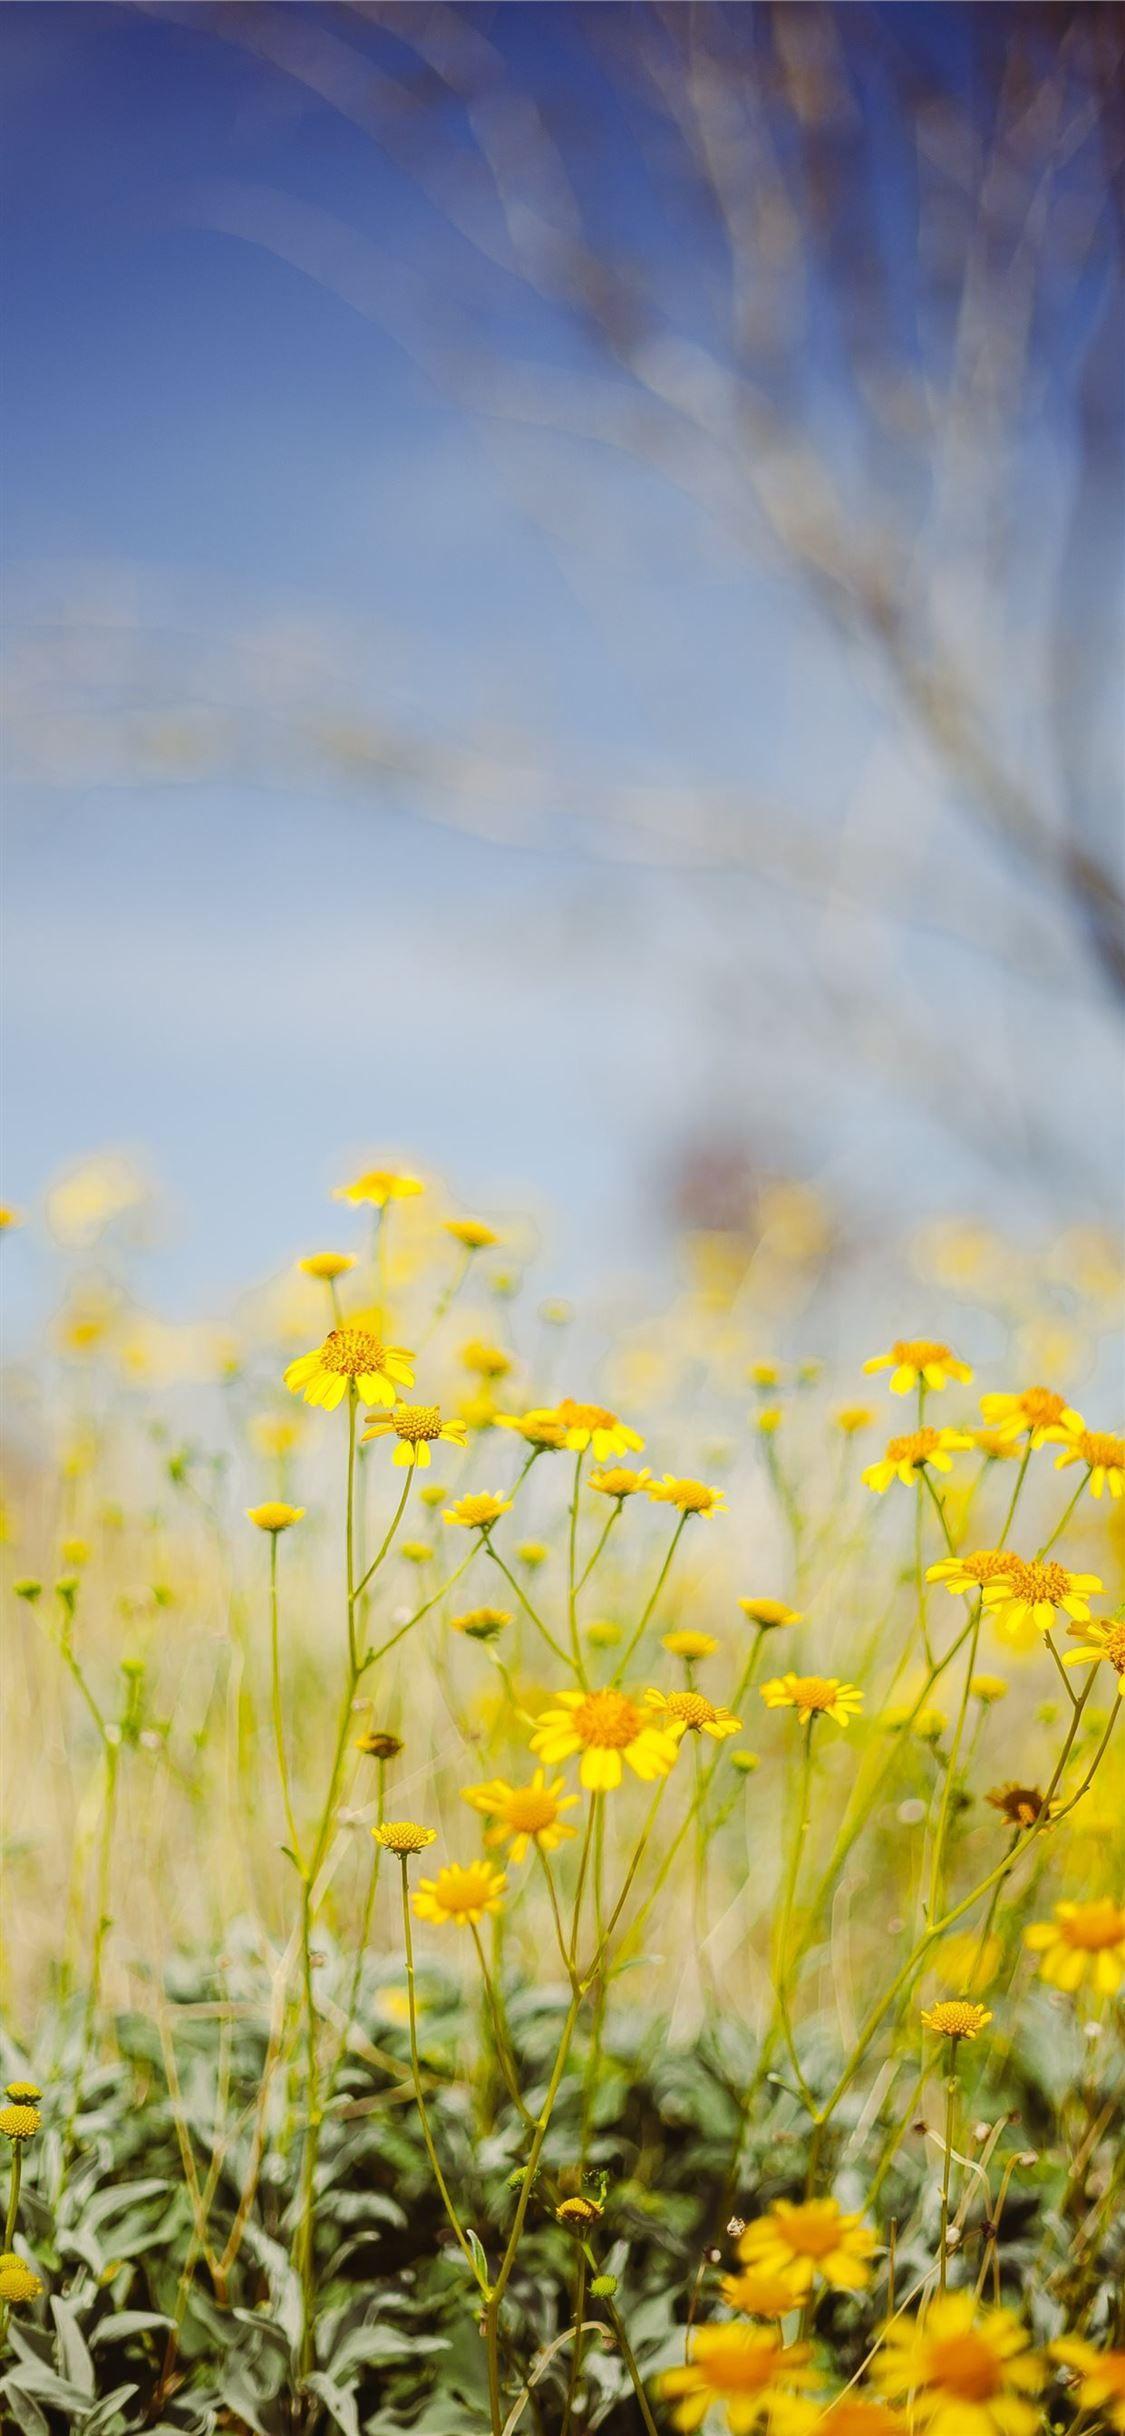 Yellow Flower Field Under Blue Sky During Daytime Nature Iphone11wallpaper Flower Field Yellow Flower Wallpaper Flower Background Wallpaper